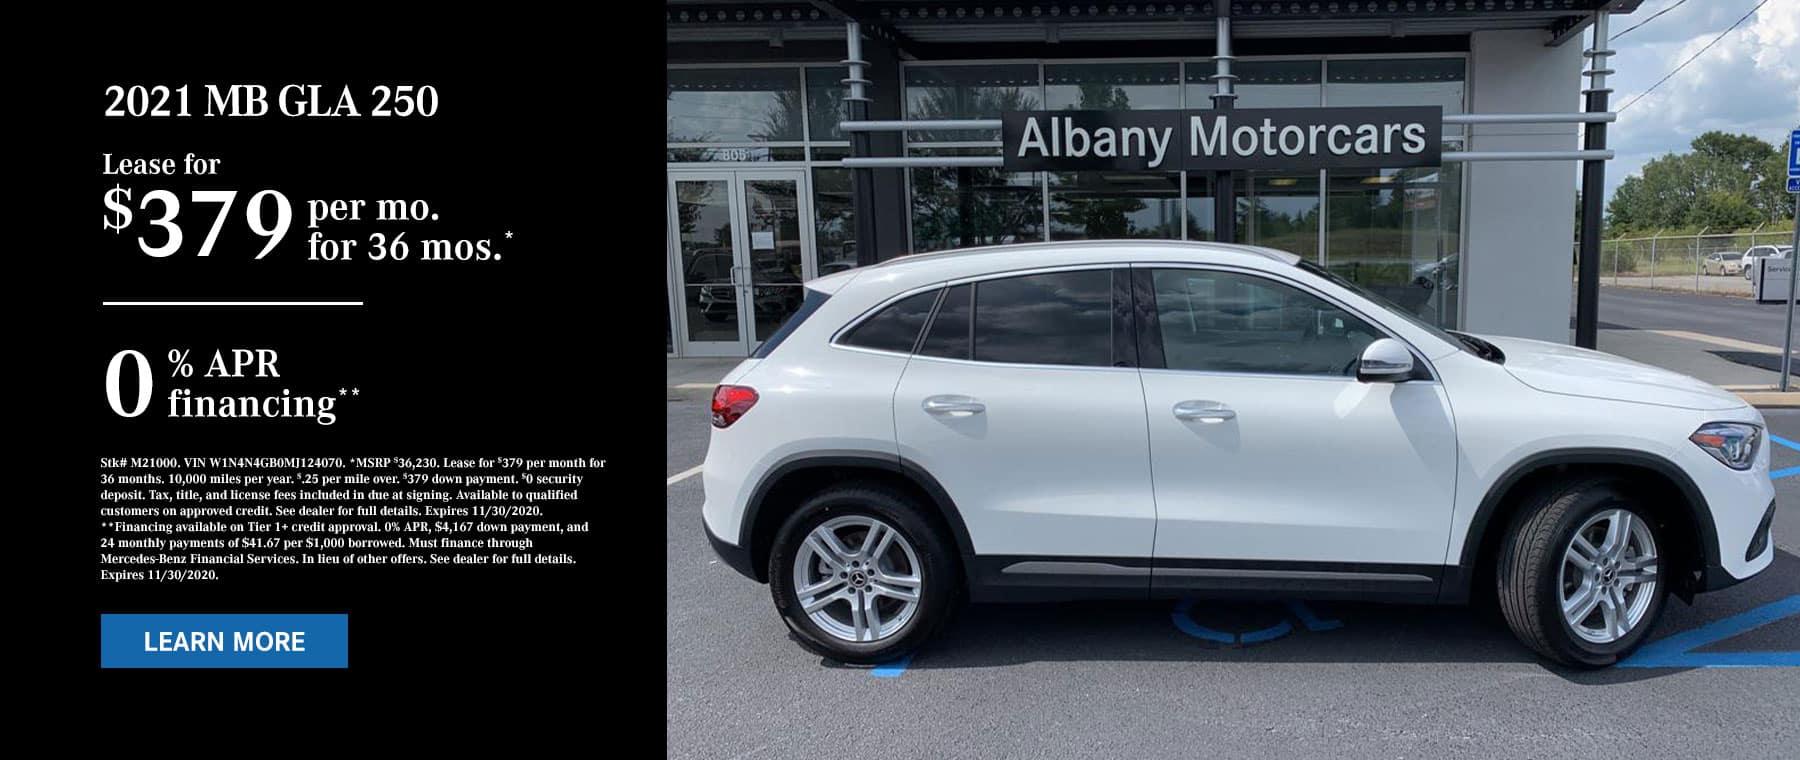 AlbanyMotorcars_Slide_1800x760_11-20